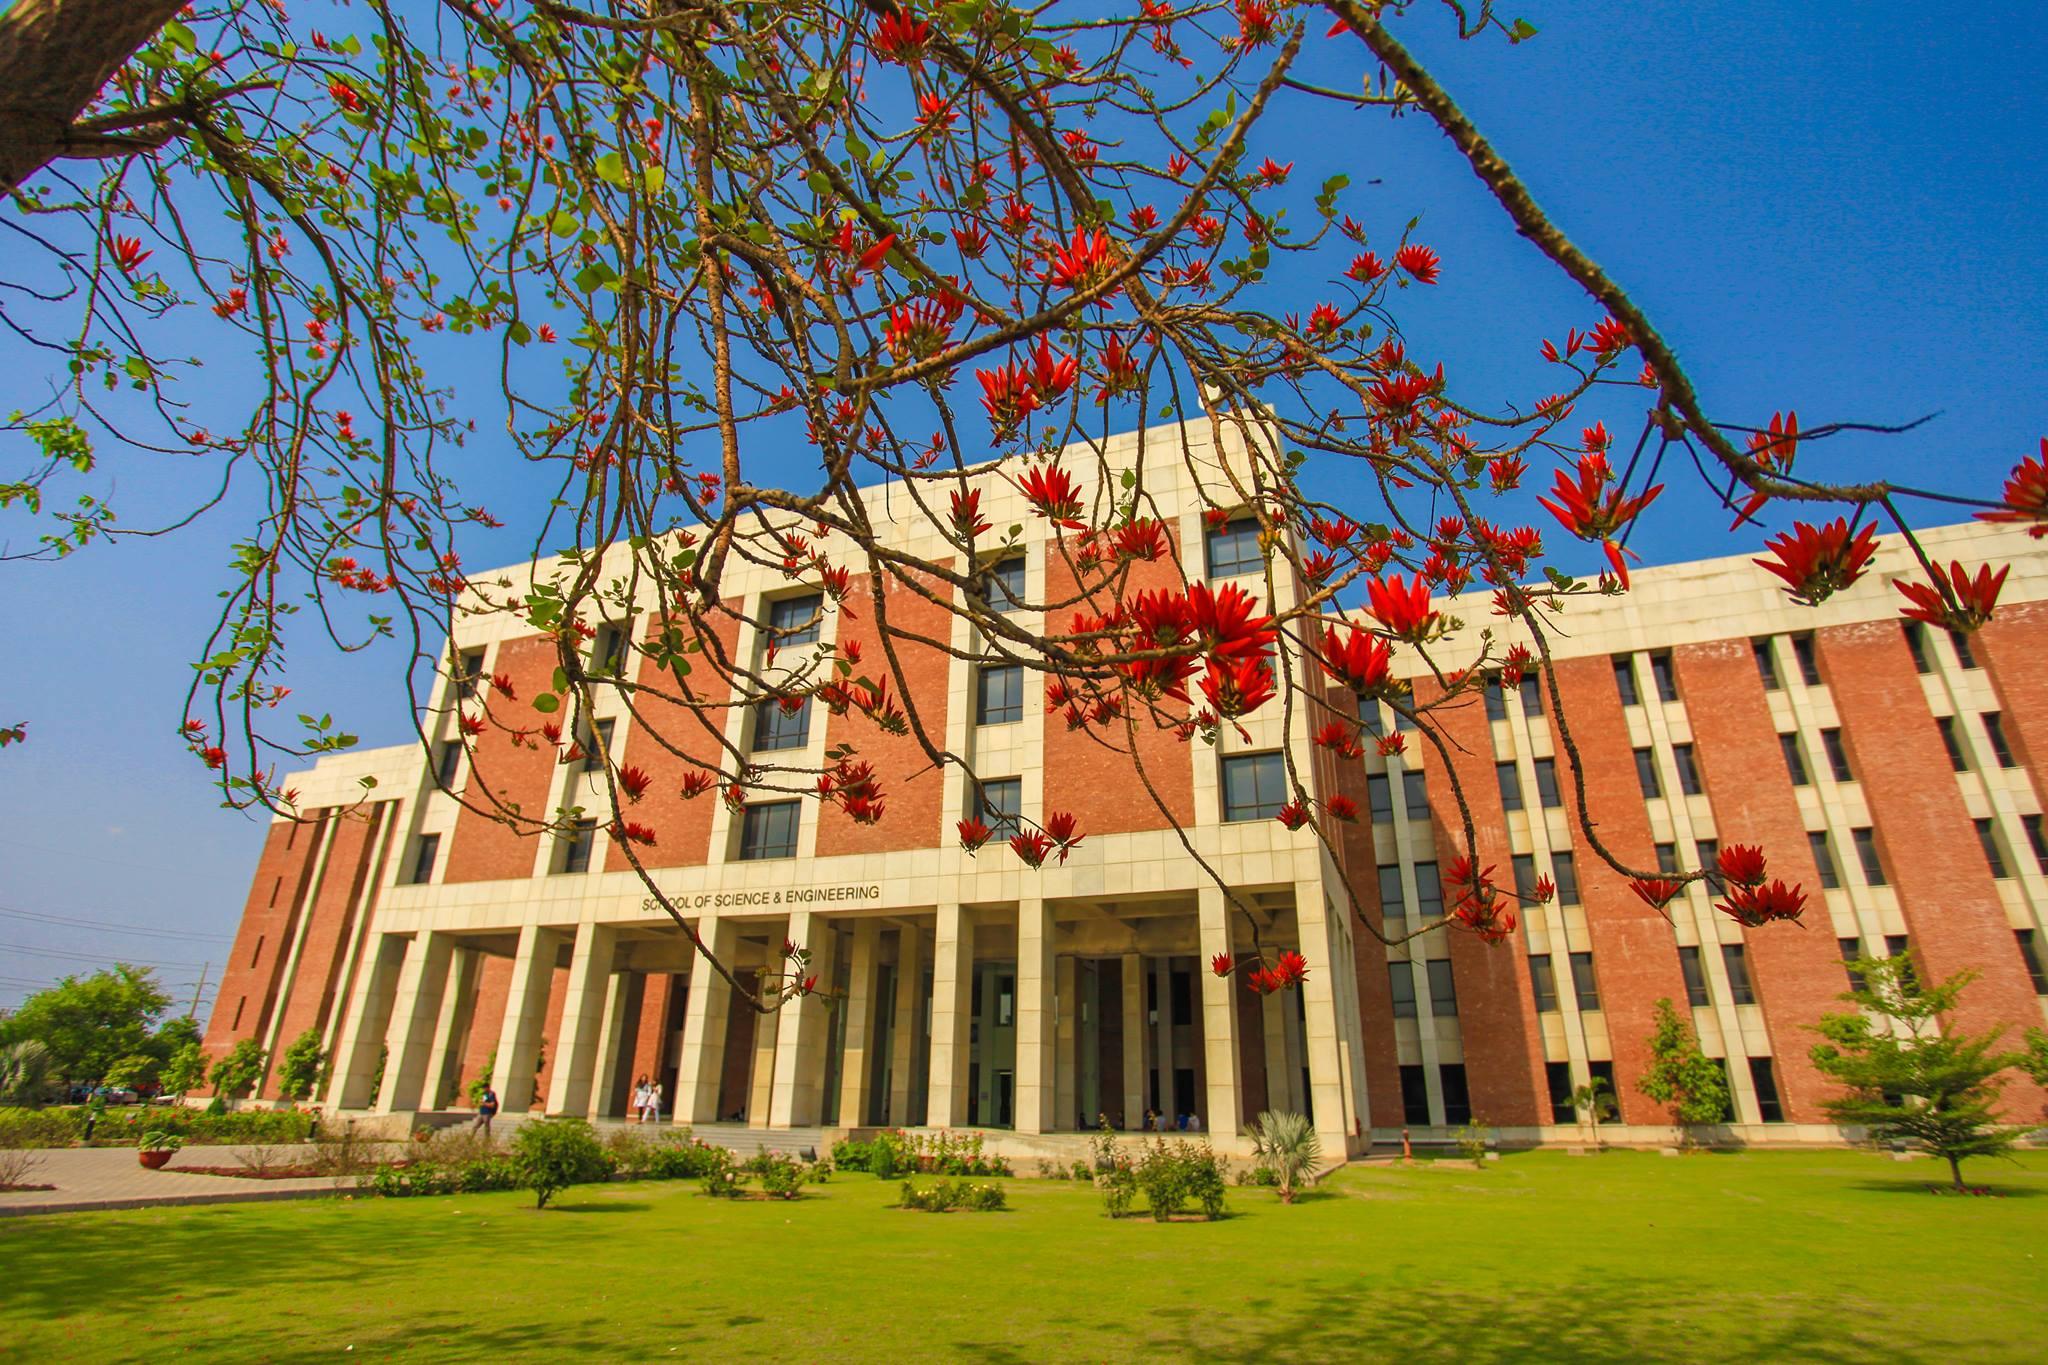 Lahore University of Management Sciences - LUMS Campus